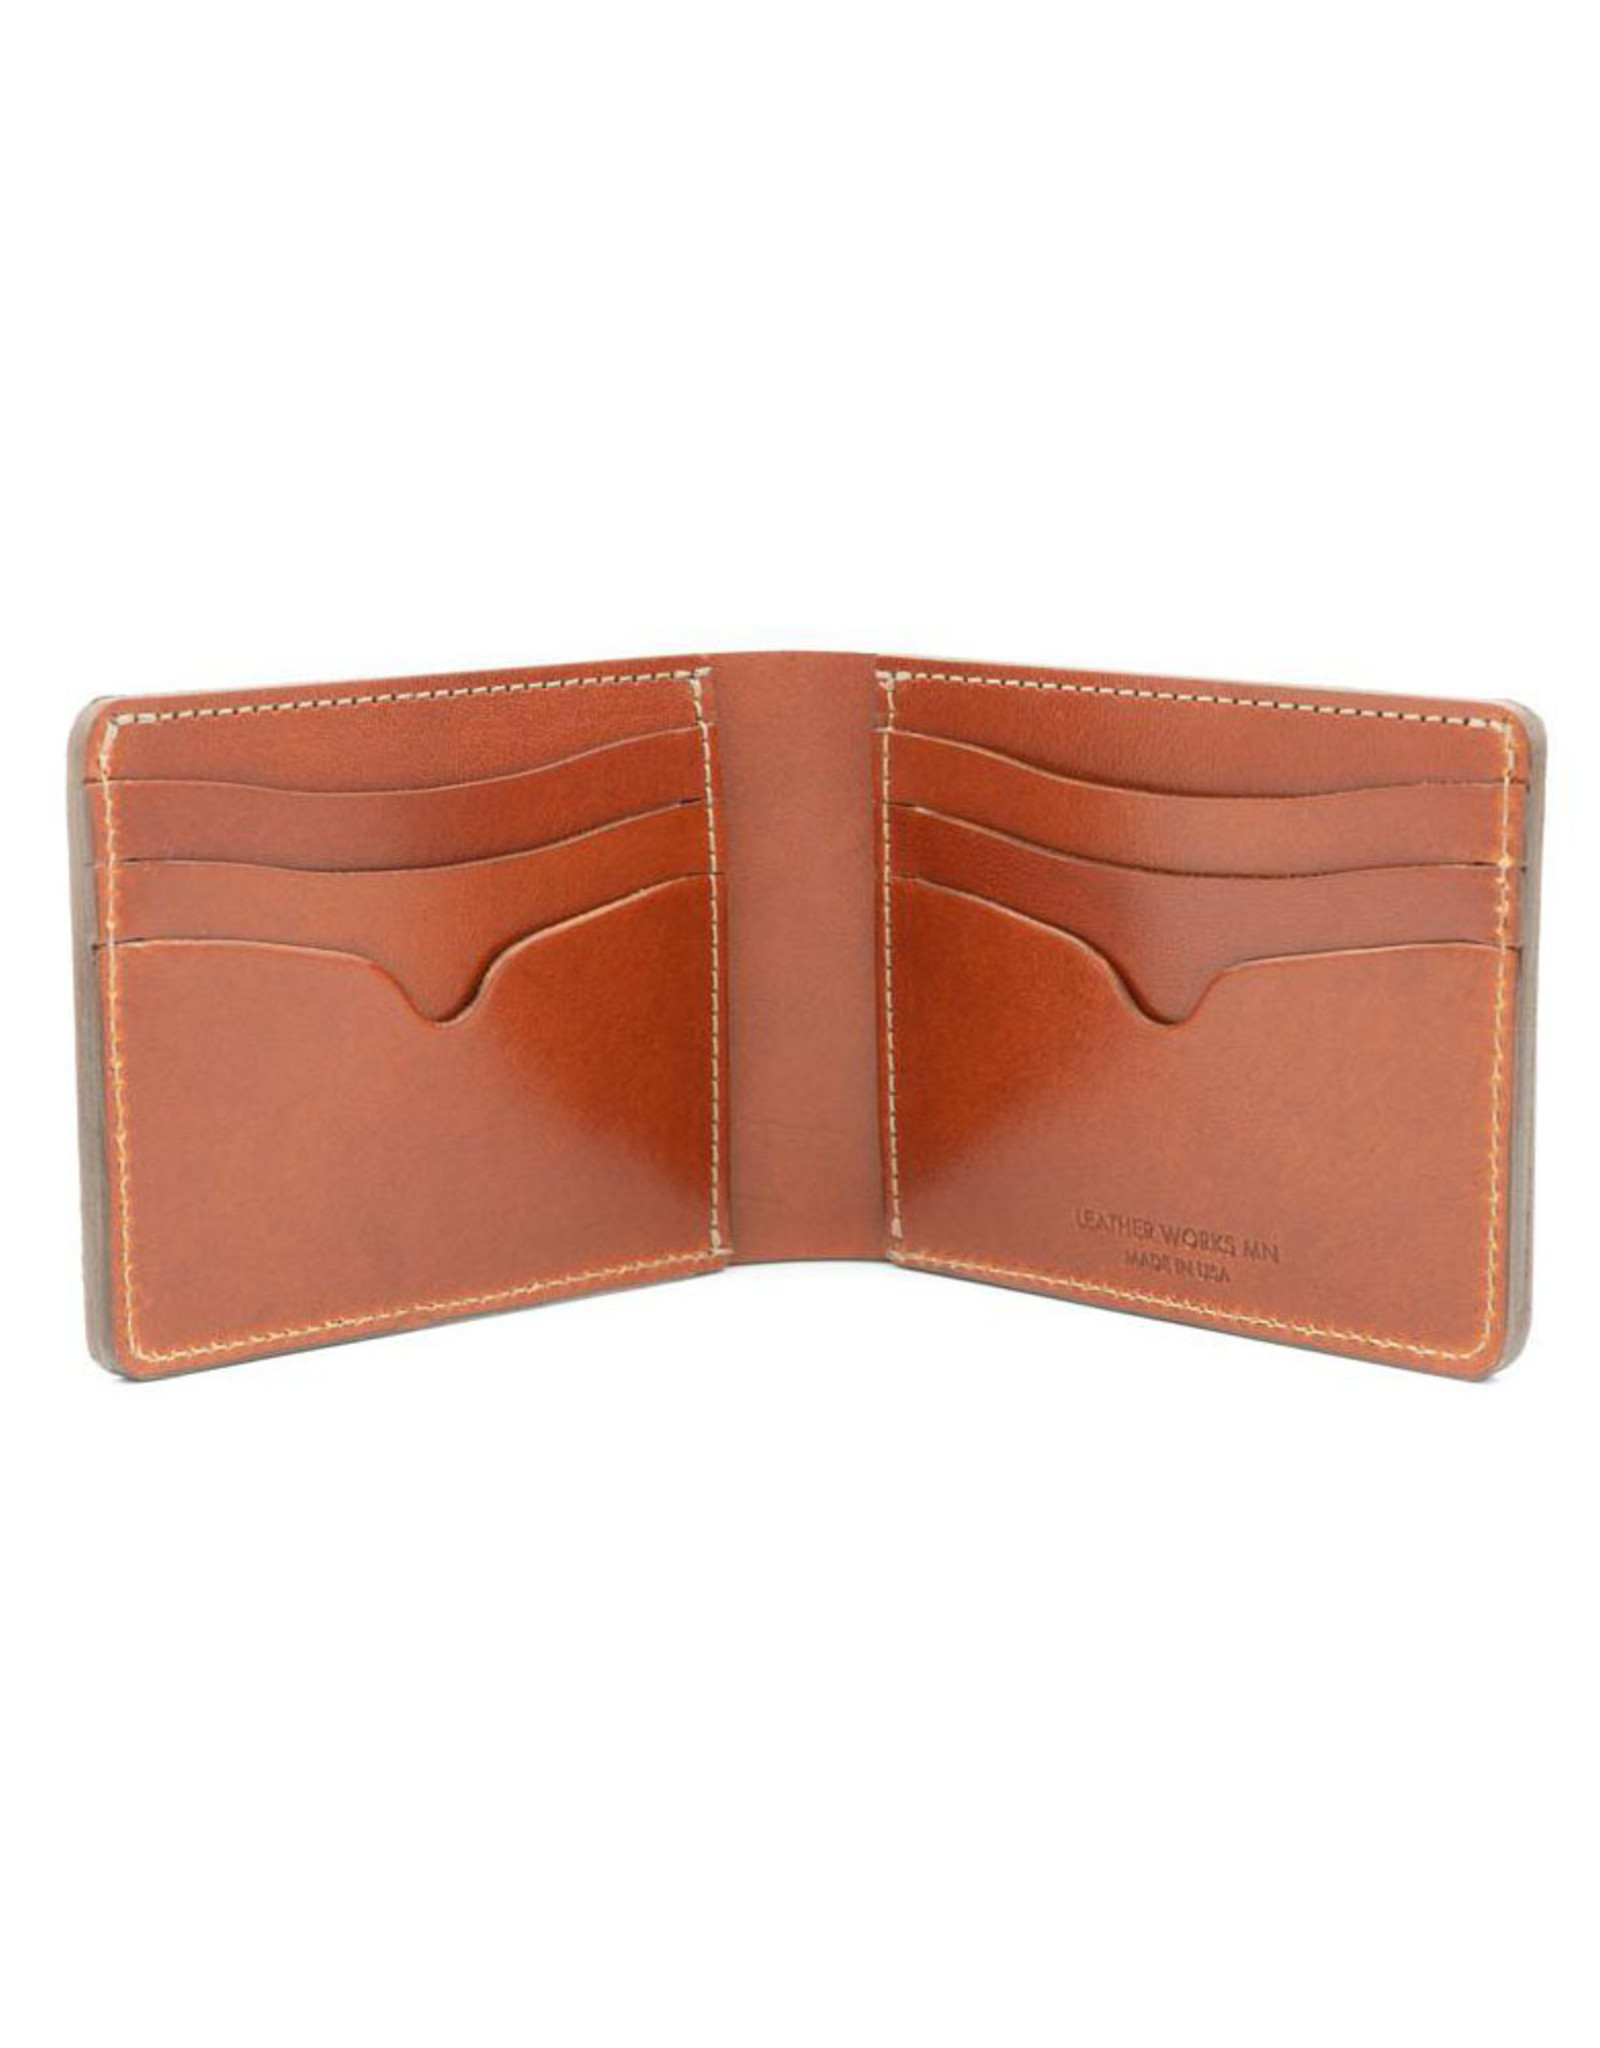 Leather Works Minnesota No. 9 Bifold Wallet Chestnut